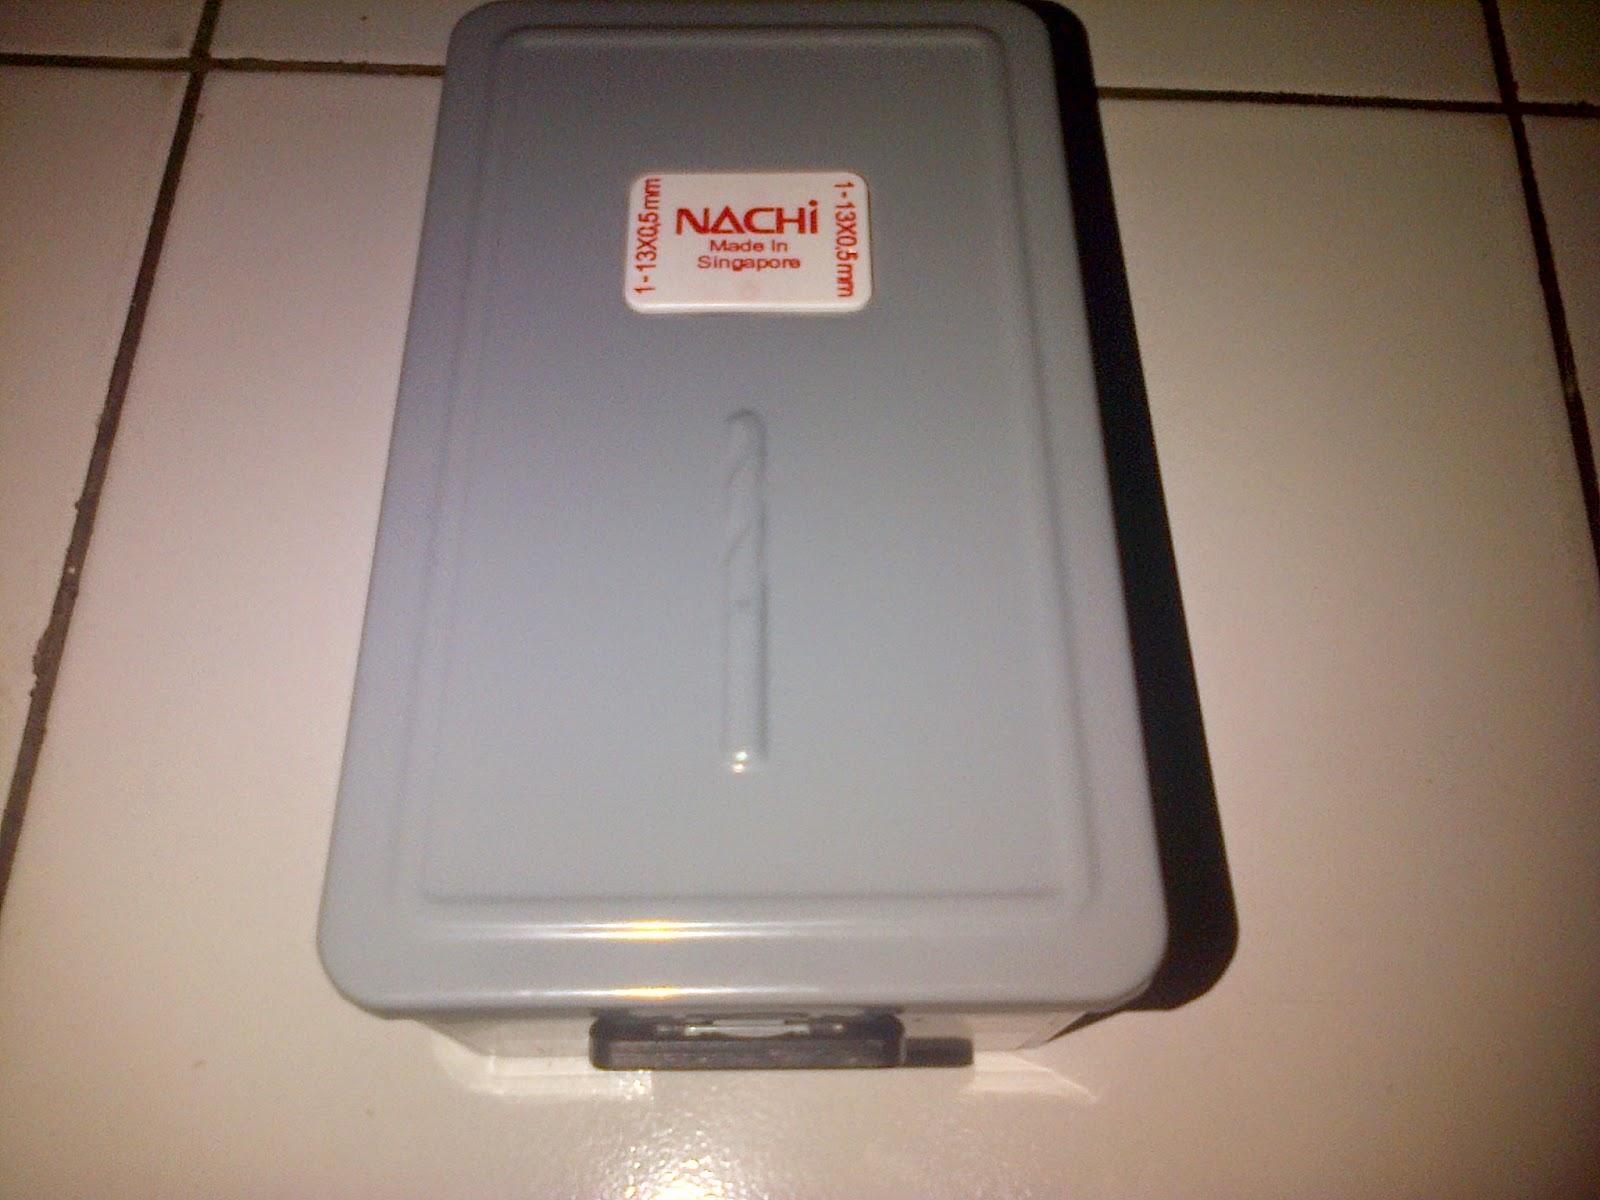 Mata Bor Besi Nachi 2 Ml Daftar Harga Terbaru Dan Terlengkap Indonesia Drill Hss Bukan Guhring Juga Guehring 7mm Set